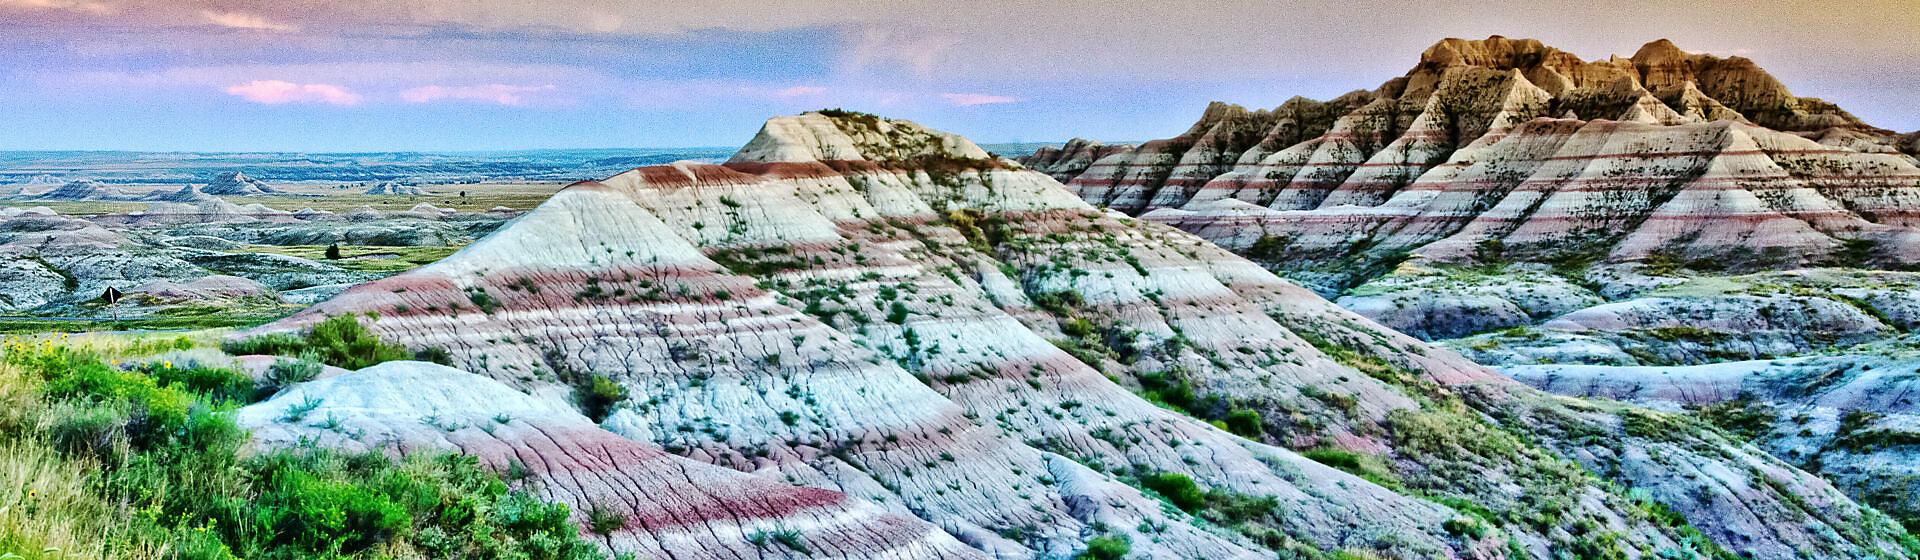 USA, South Dakota, Badlands National Park, Bergkamm